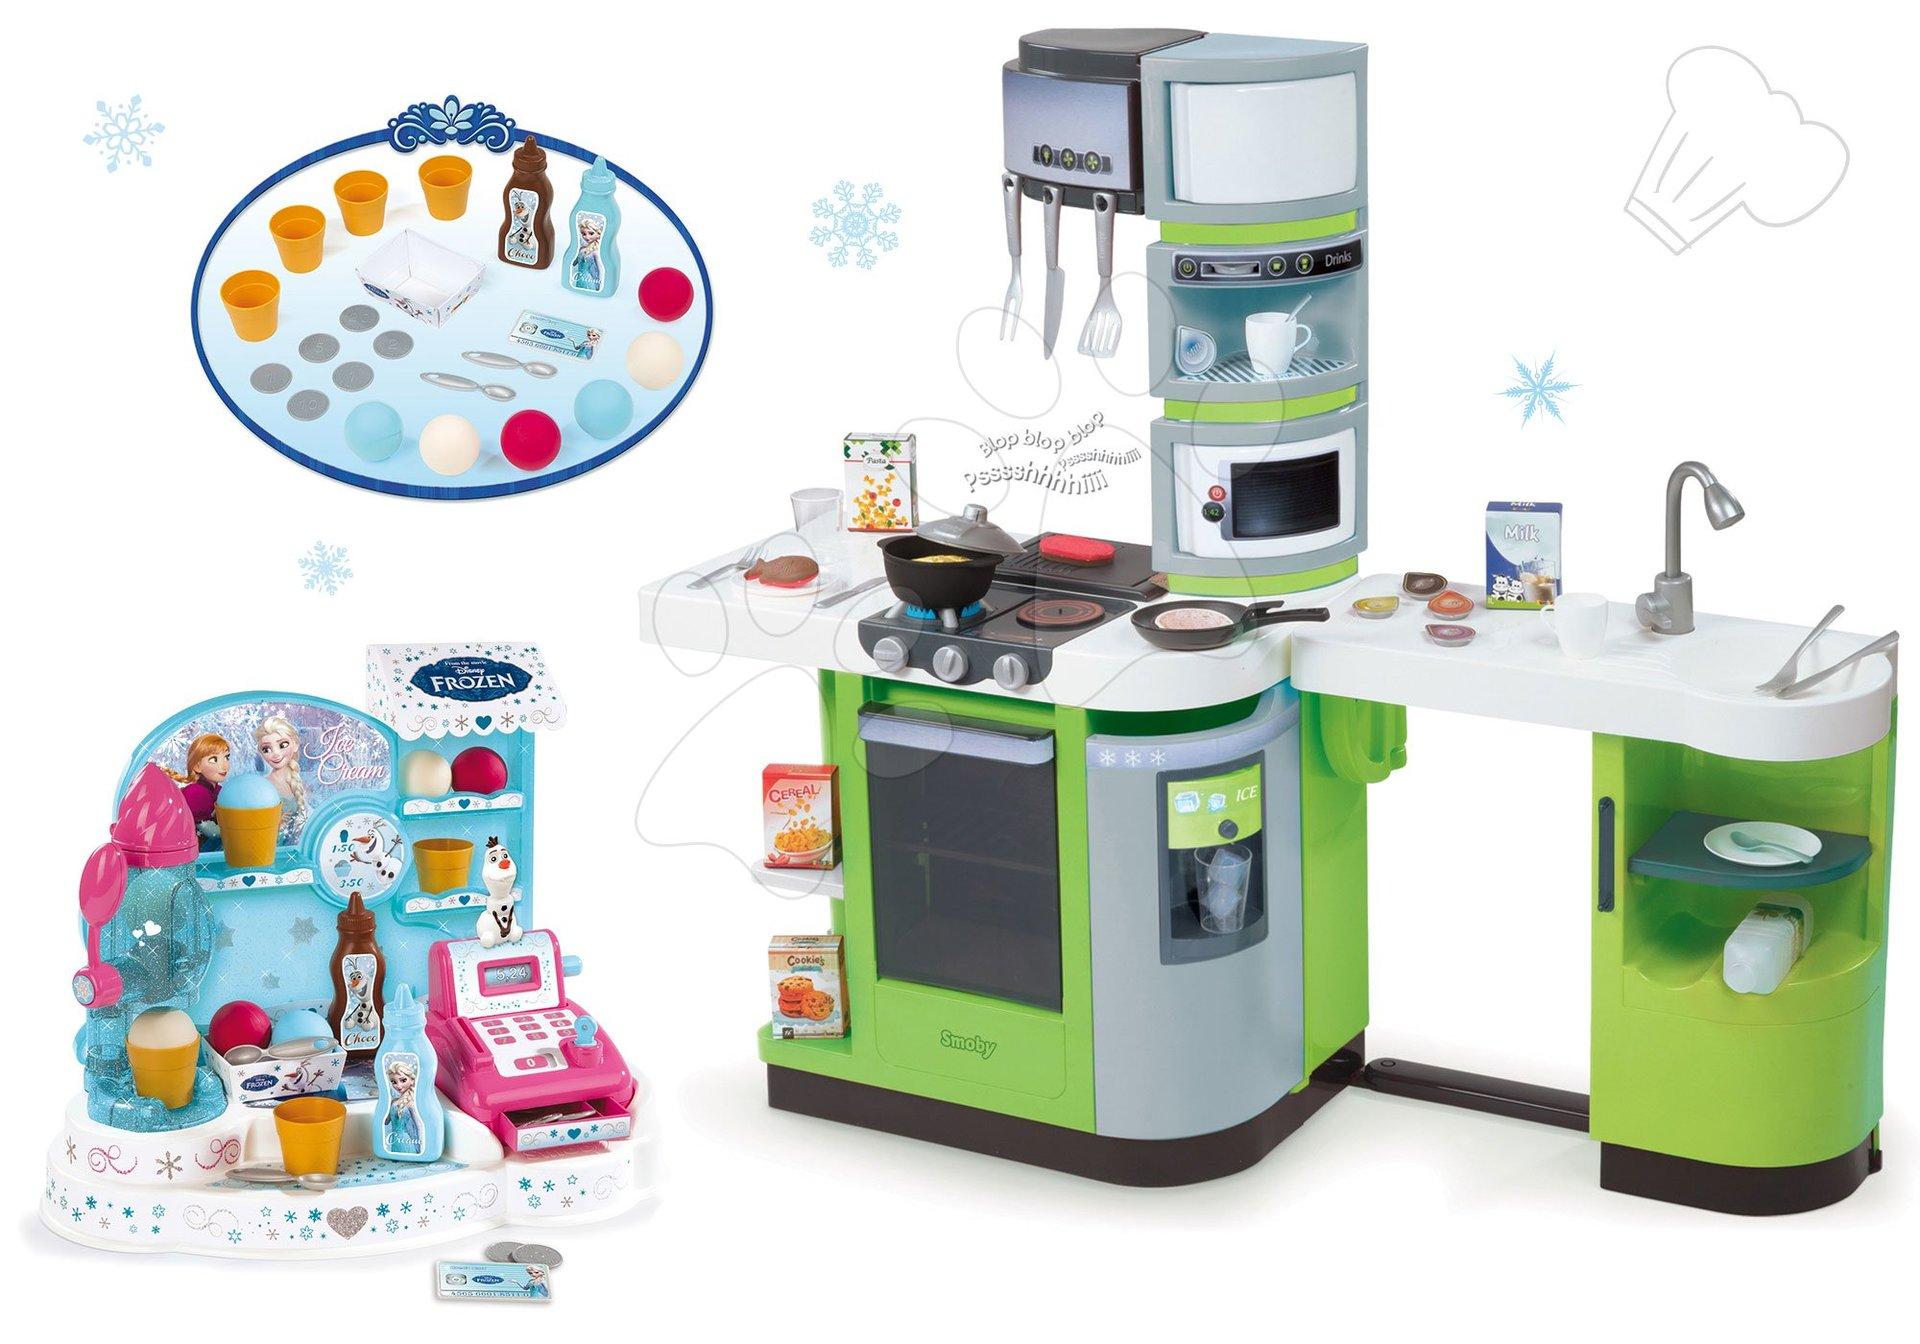 Kuchynky pre deti sety - Set kuchynka CookMaster Verte Smoby s ľadom a zvukmi a zmrzlináreň Frozen